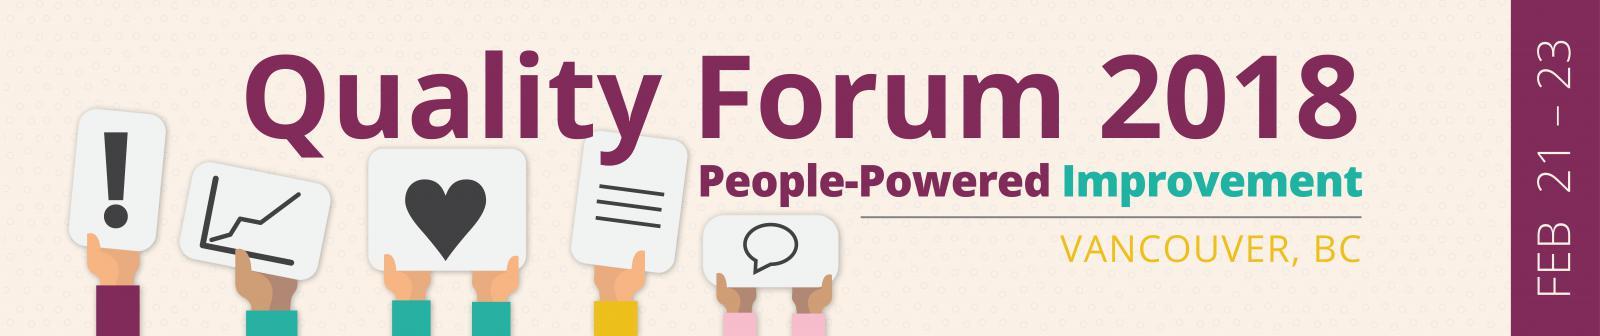 Quality Forum 2018